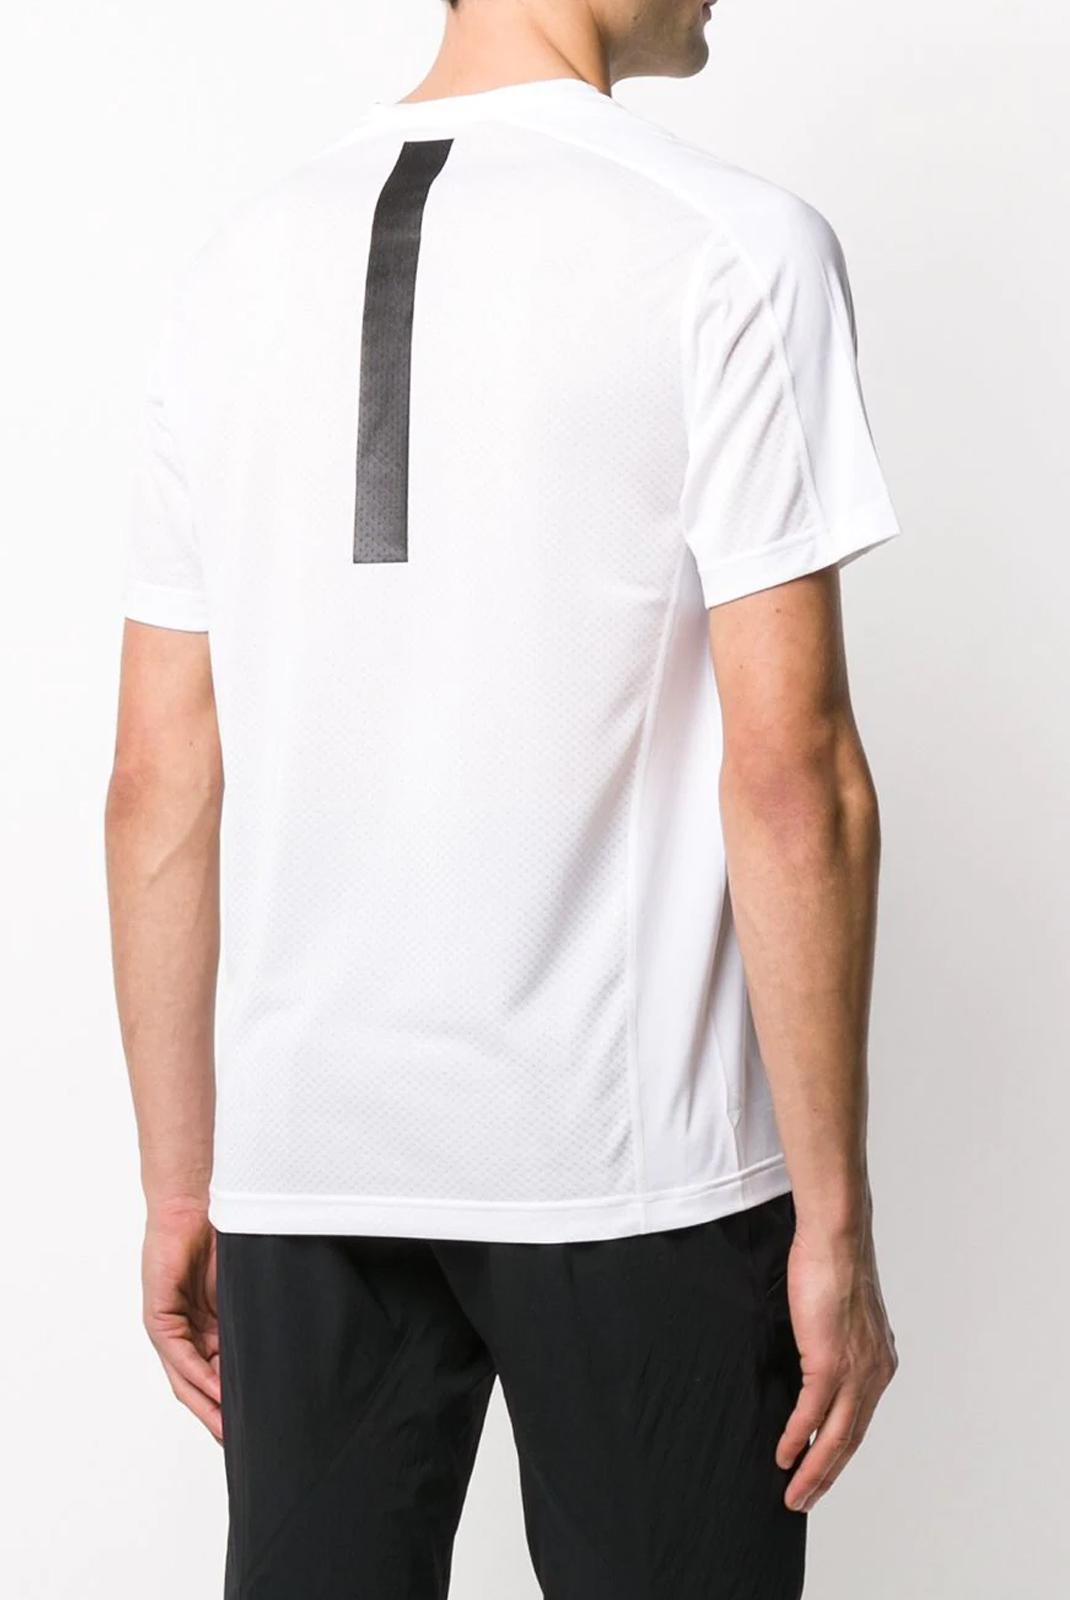 T-S manches courtes  Calvin klein 00GMS8K145-100 Bright White